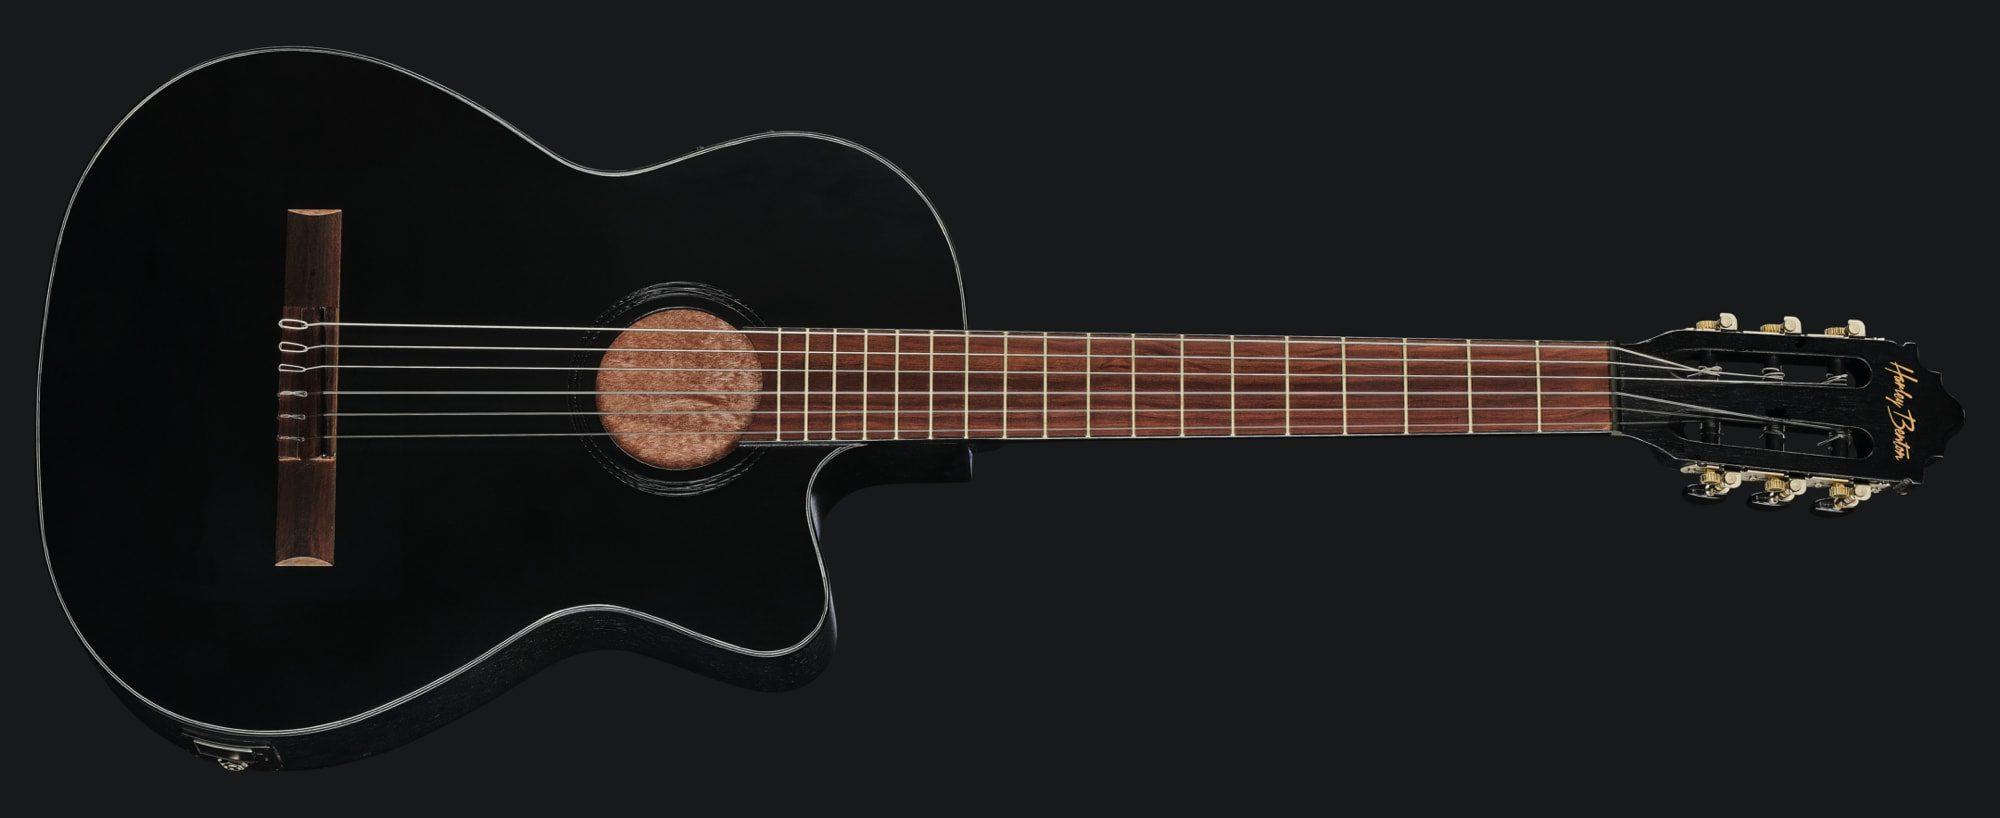 Harley Benton CG-400CE Thinline